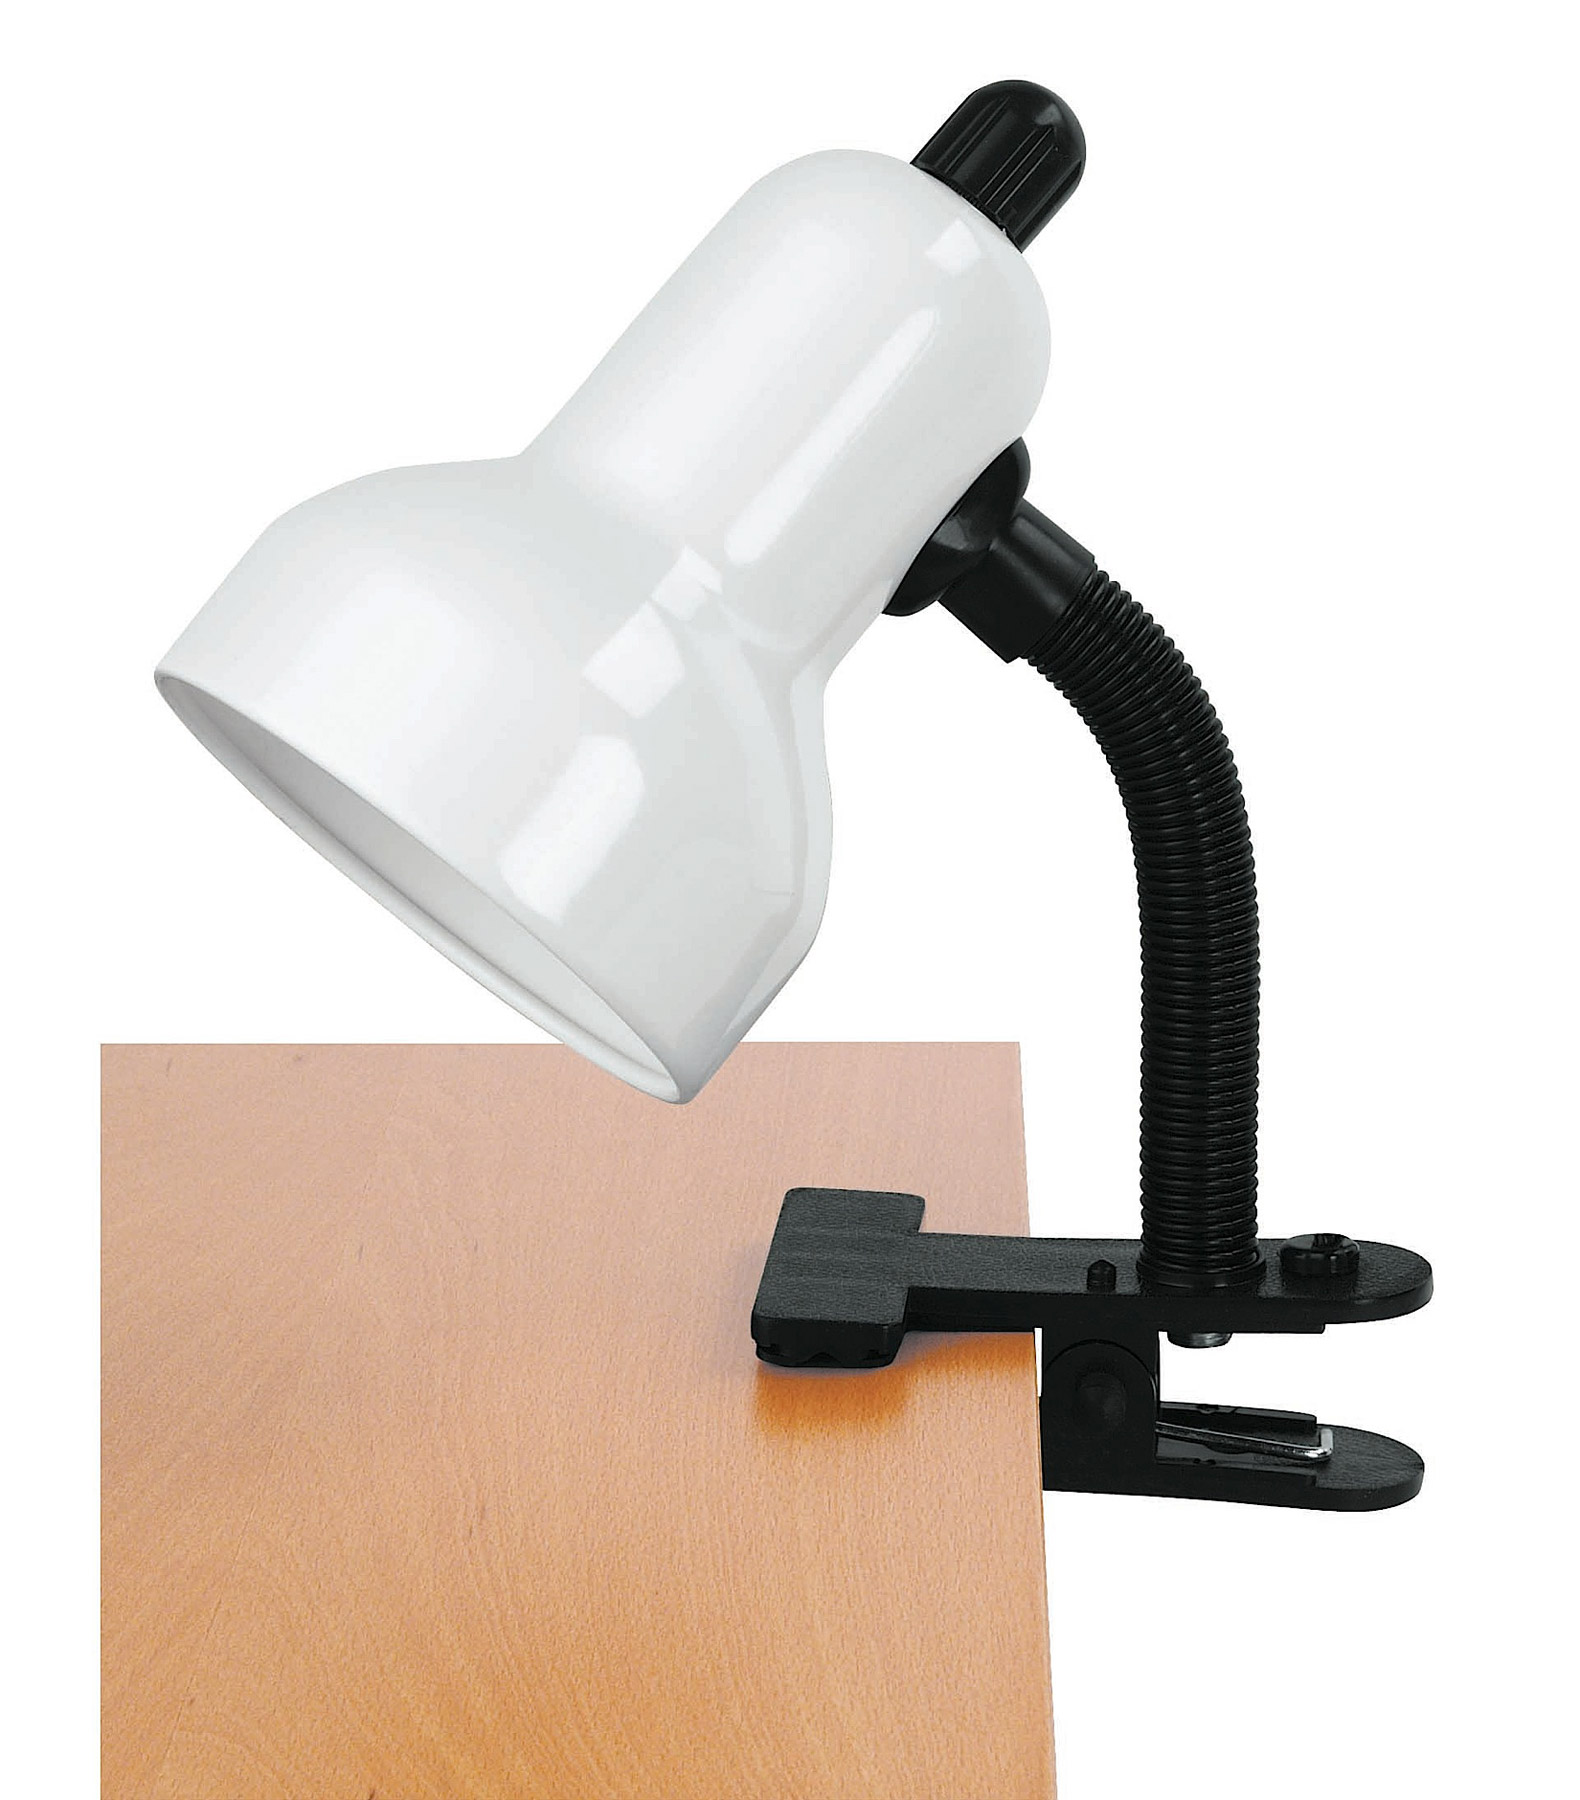 home lamps table lamps desk lamps lite source ls 111wht. Black Bedroom Furniture Sets. Home Design Ideas